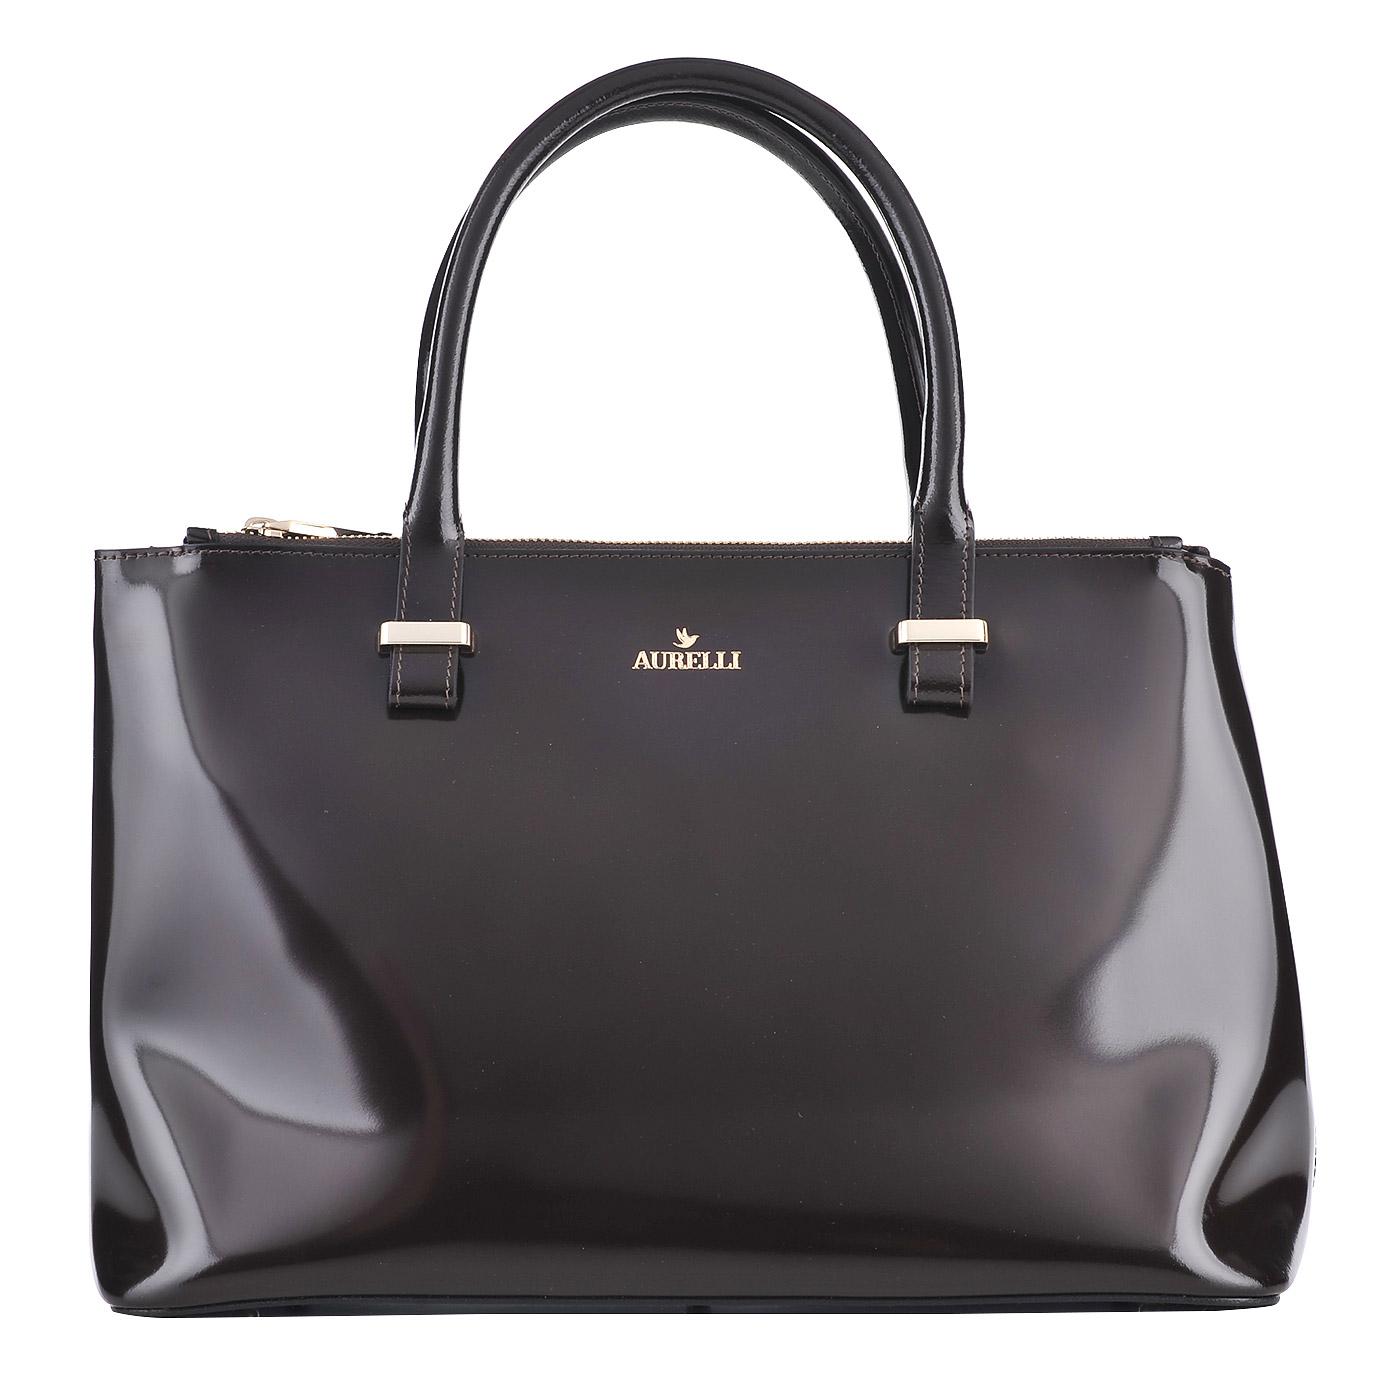 5f2d5aba1250 Женская кожаная сумка Aurelli 15W002-72G-t.moro - 2000557692978 ...